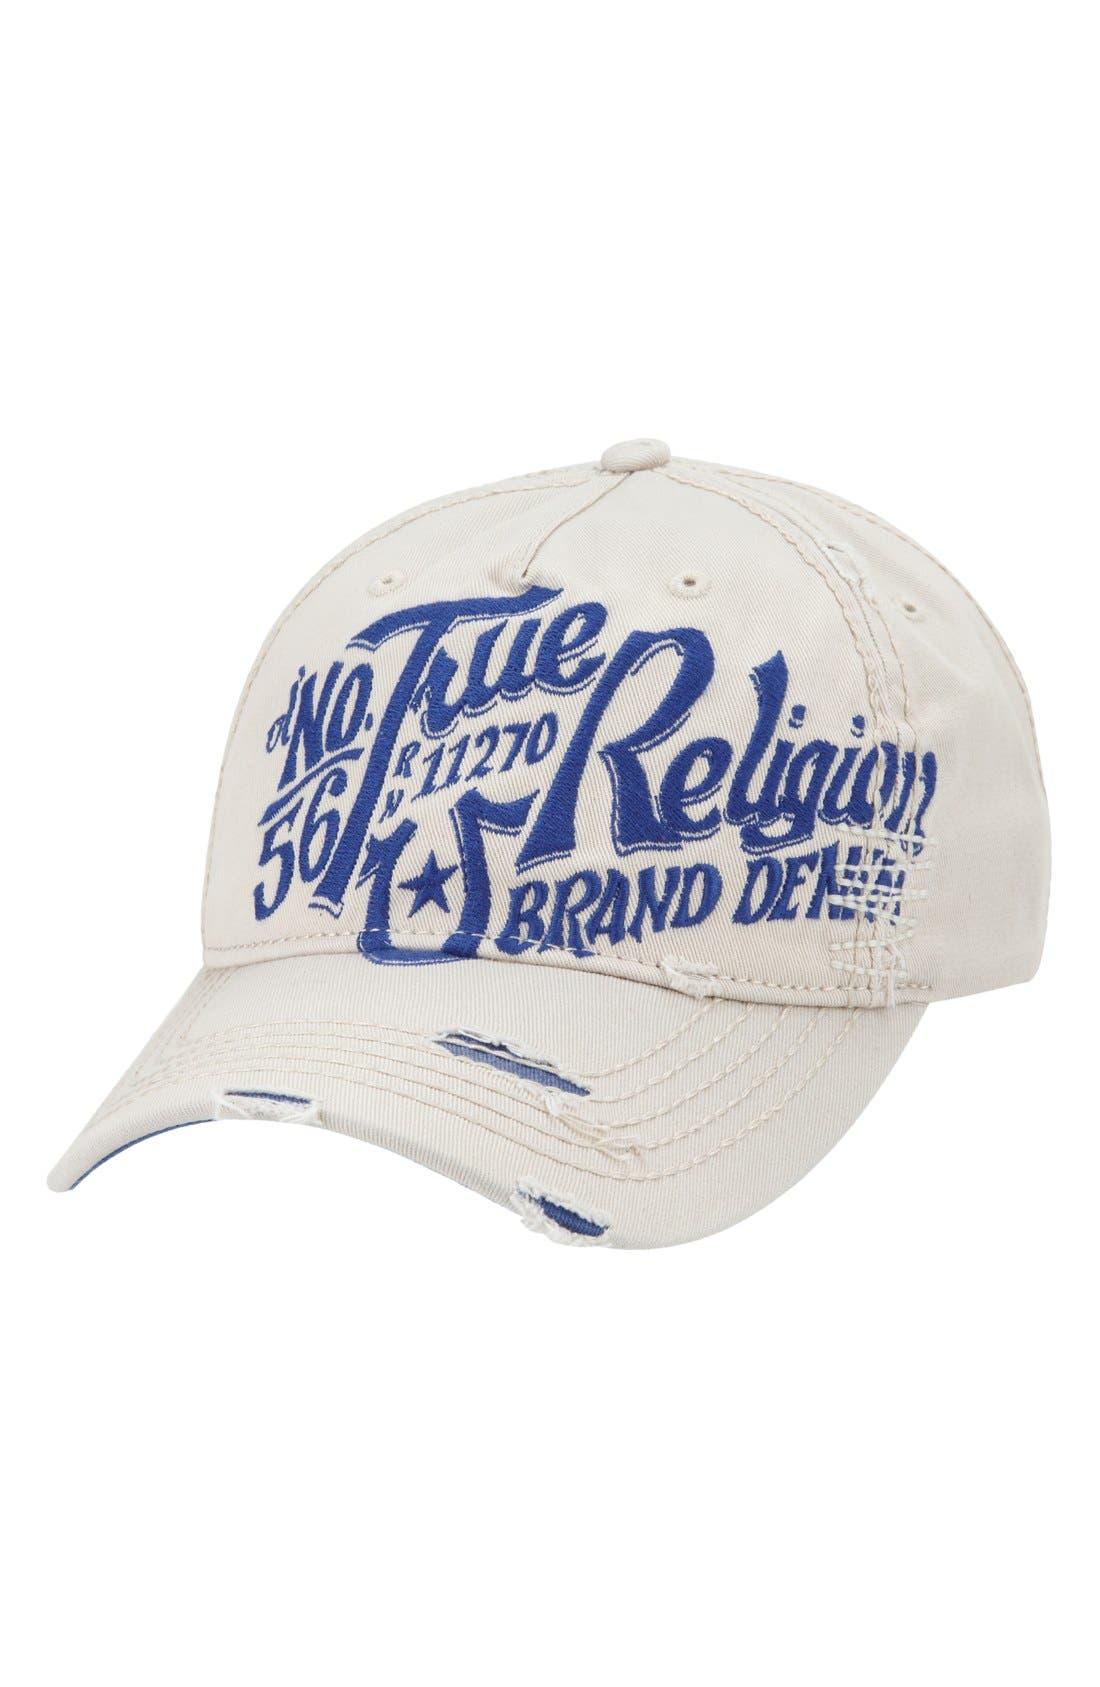 Main Image - True Religion Brand Jeans 'Ol 56' Baseball Cap